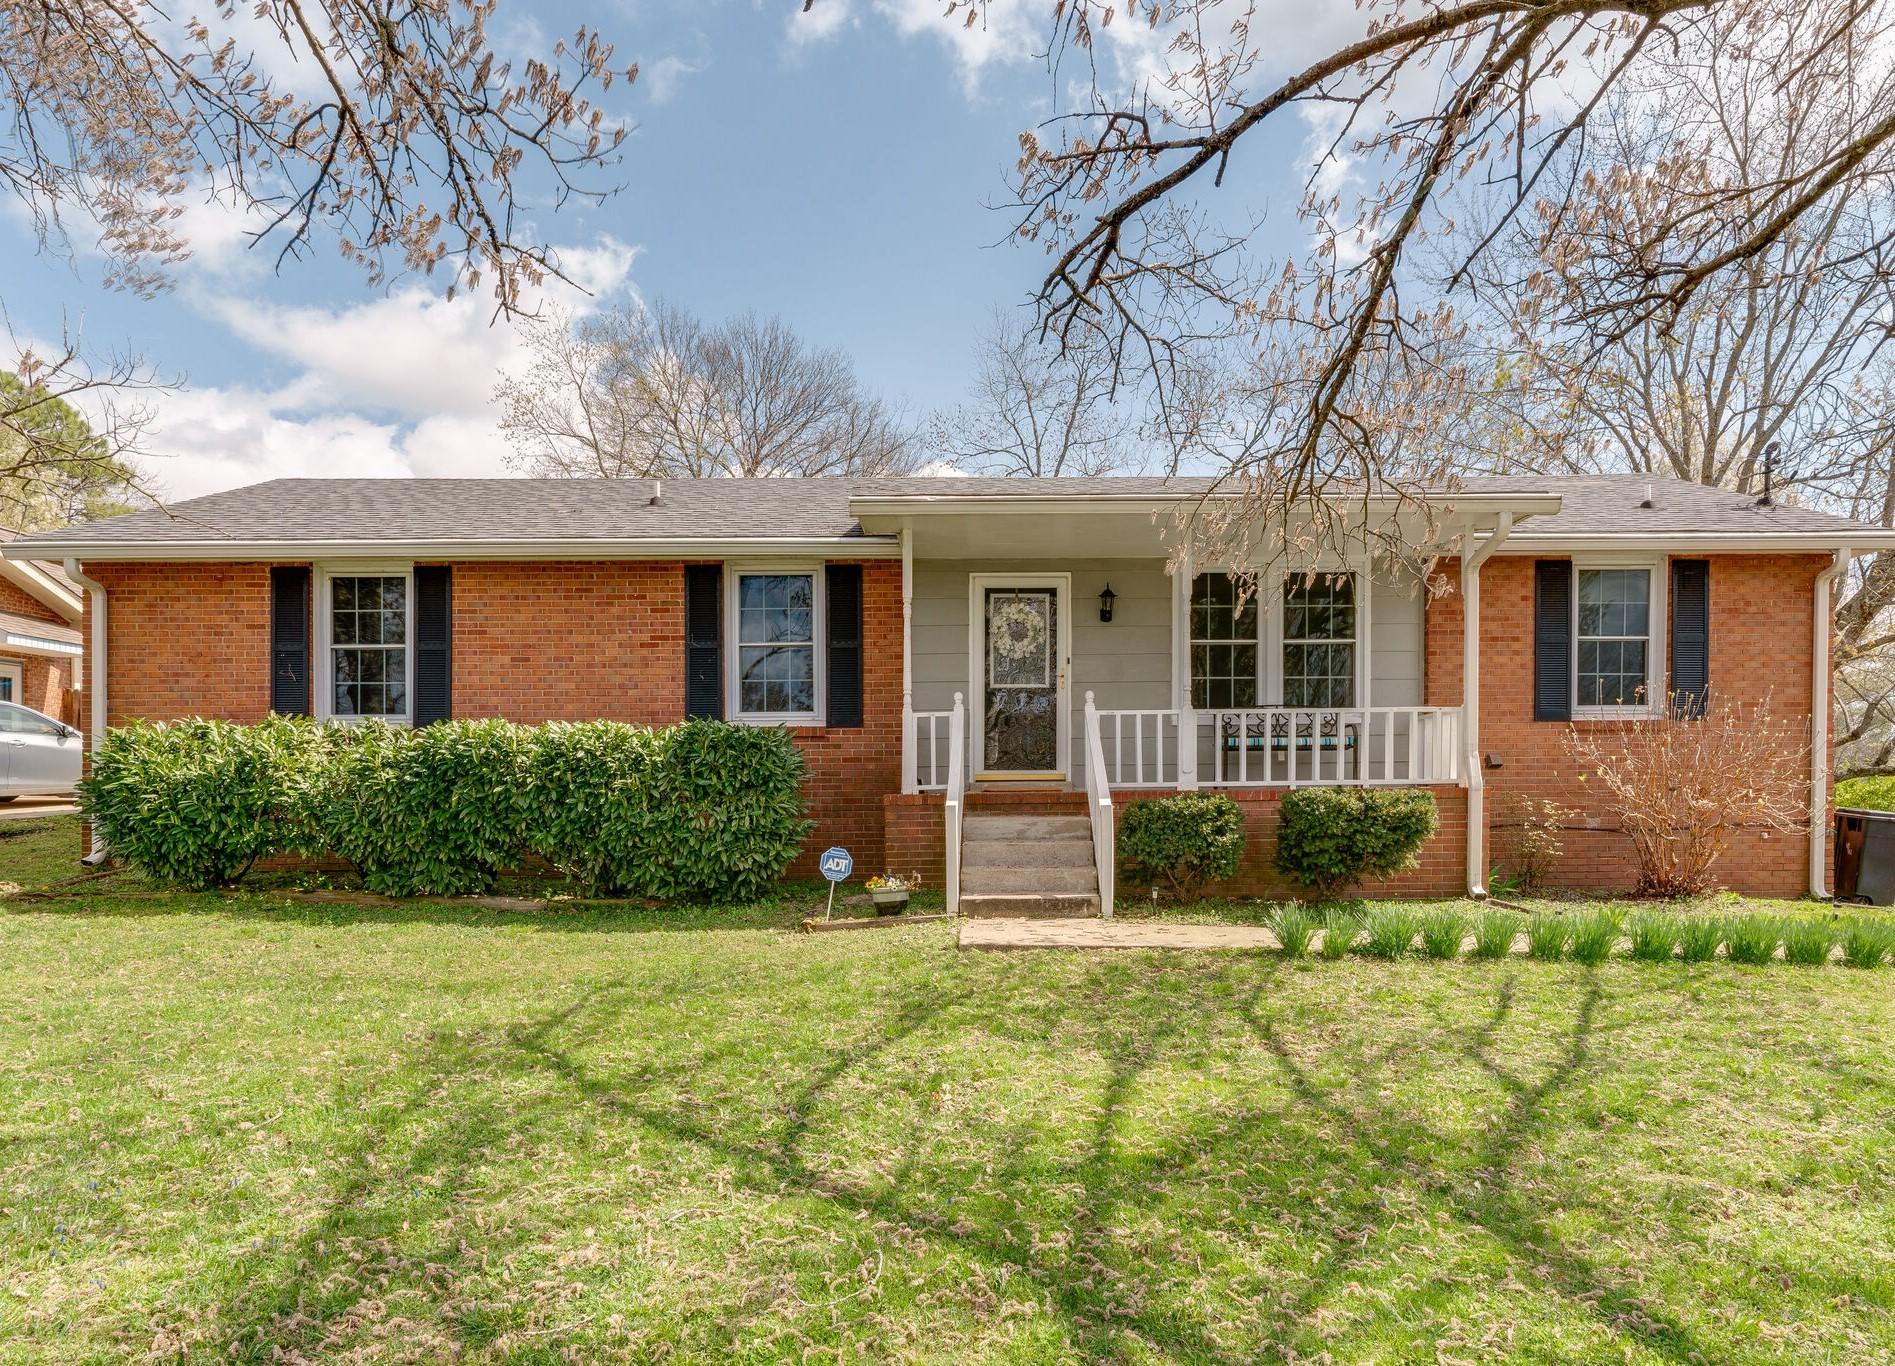 106 Hillwood Dr Property Photo - Hendersonville, TN real estate listing